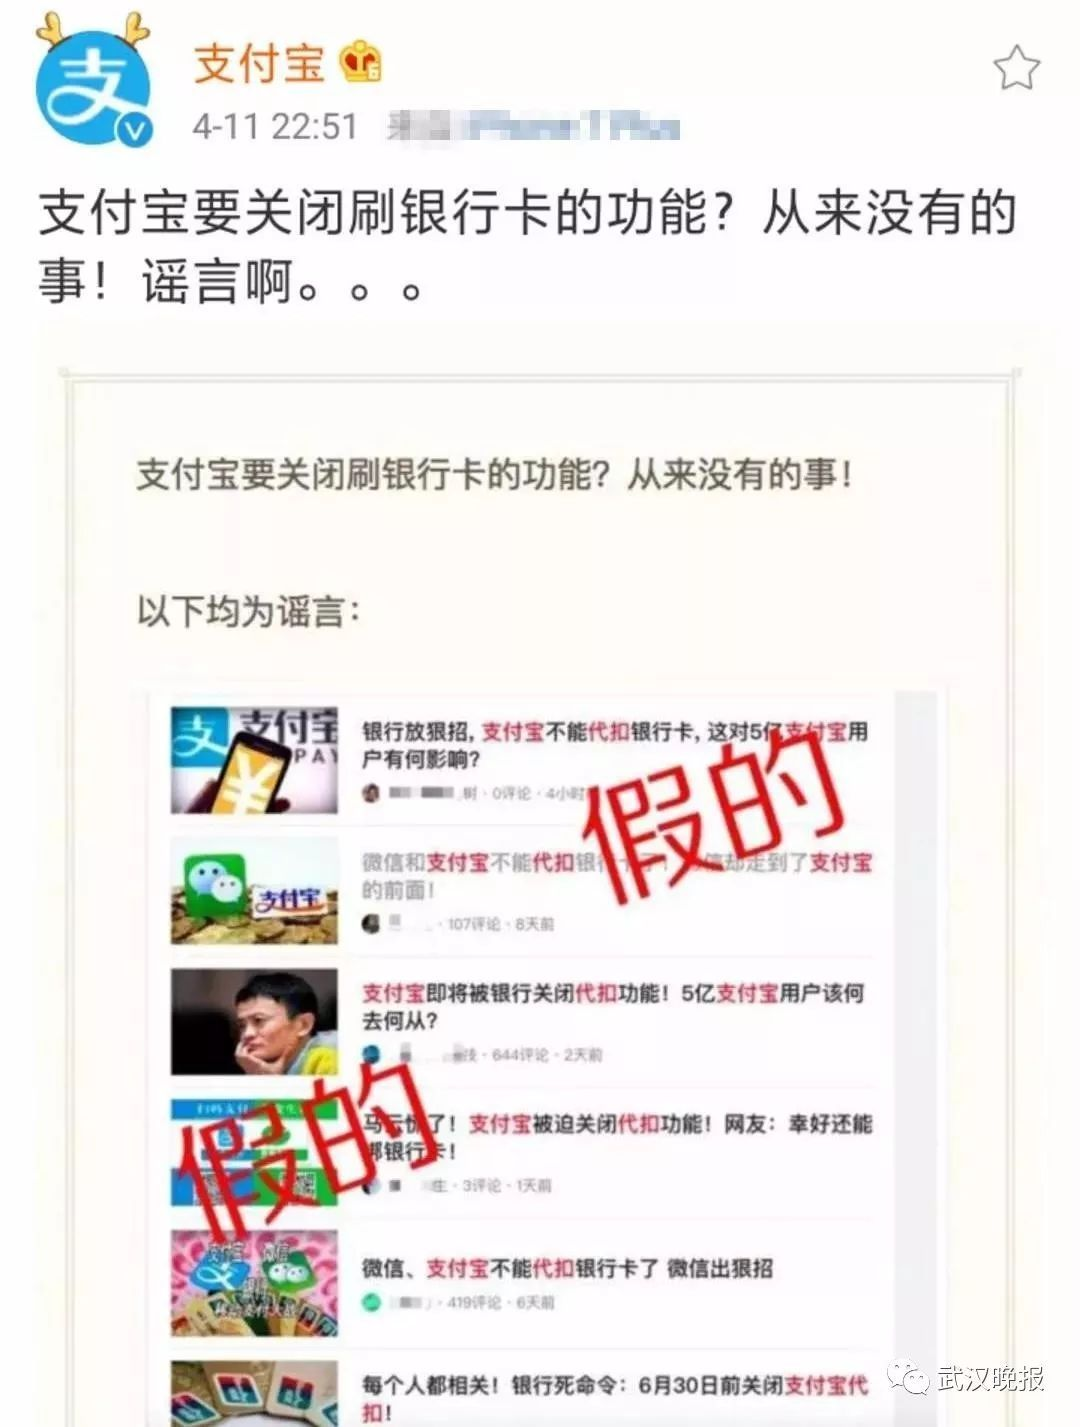 c1驾驶证多少年一审_什么是c1驾驶证多少年一审 -【... _汽车中国